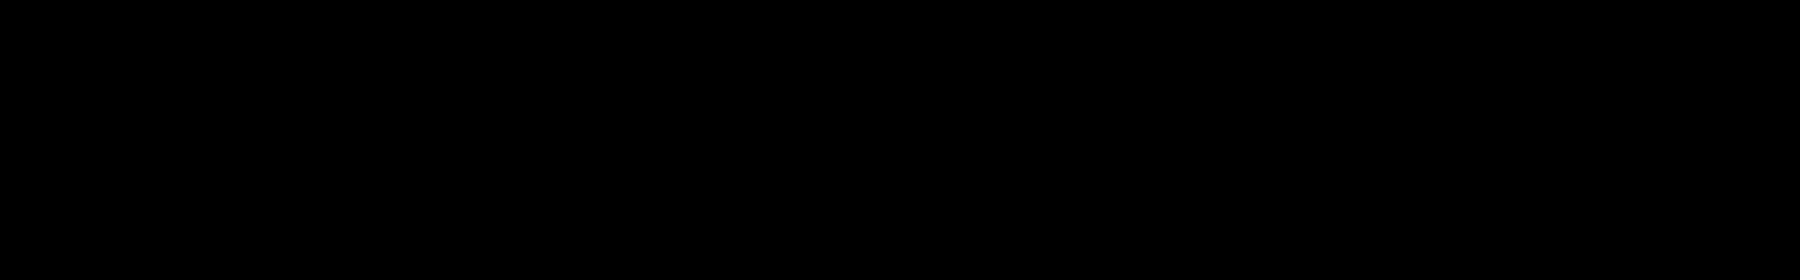 FLAME audio waveform